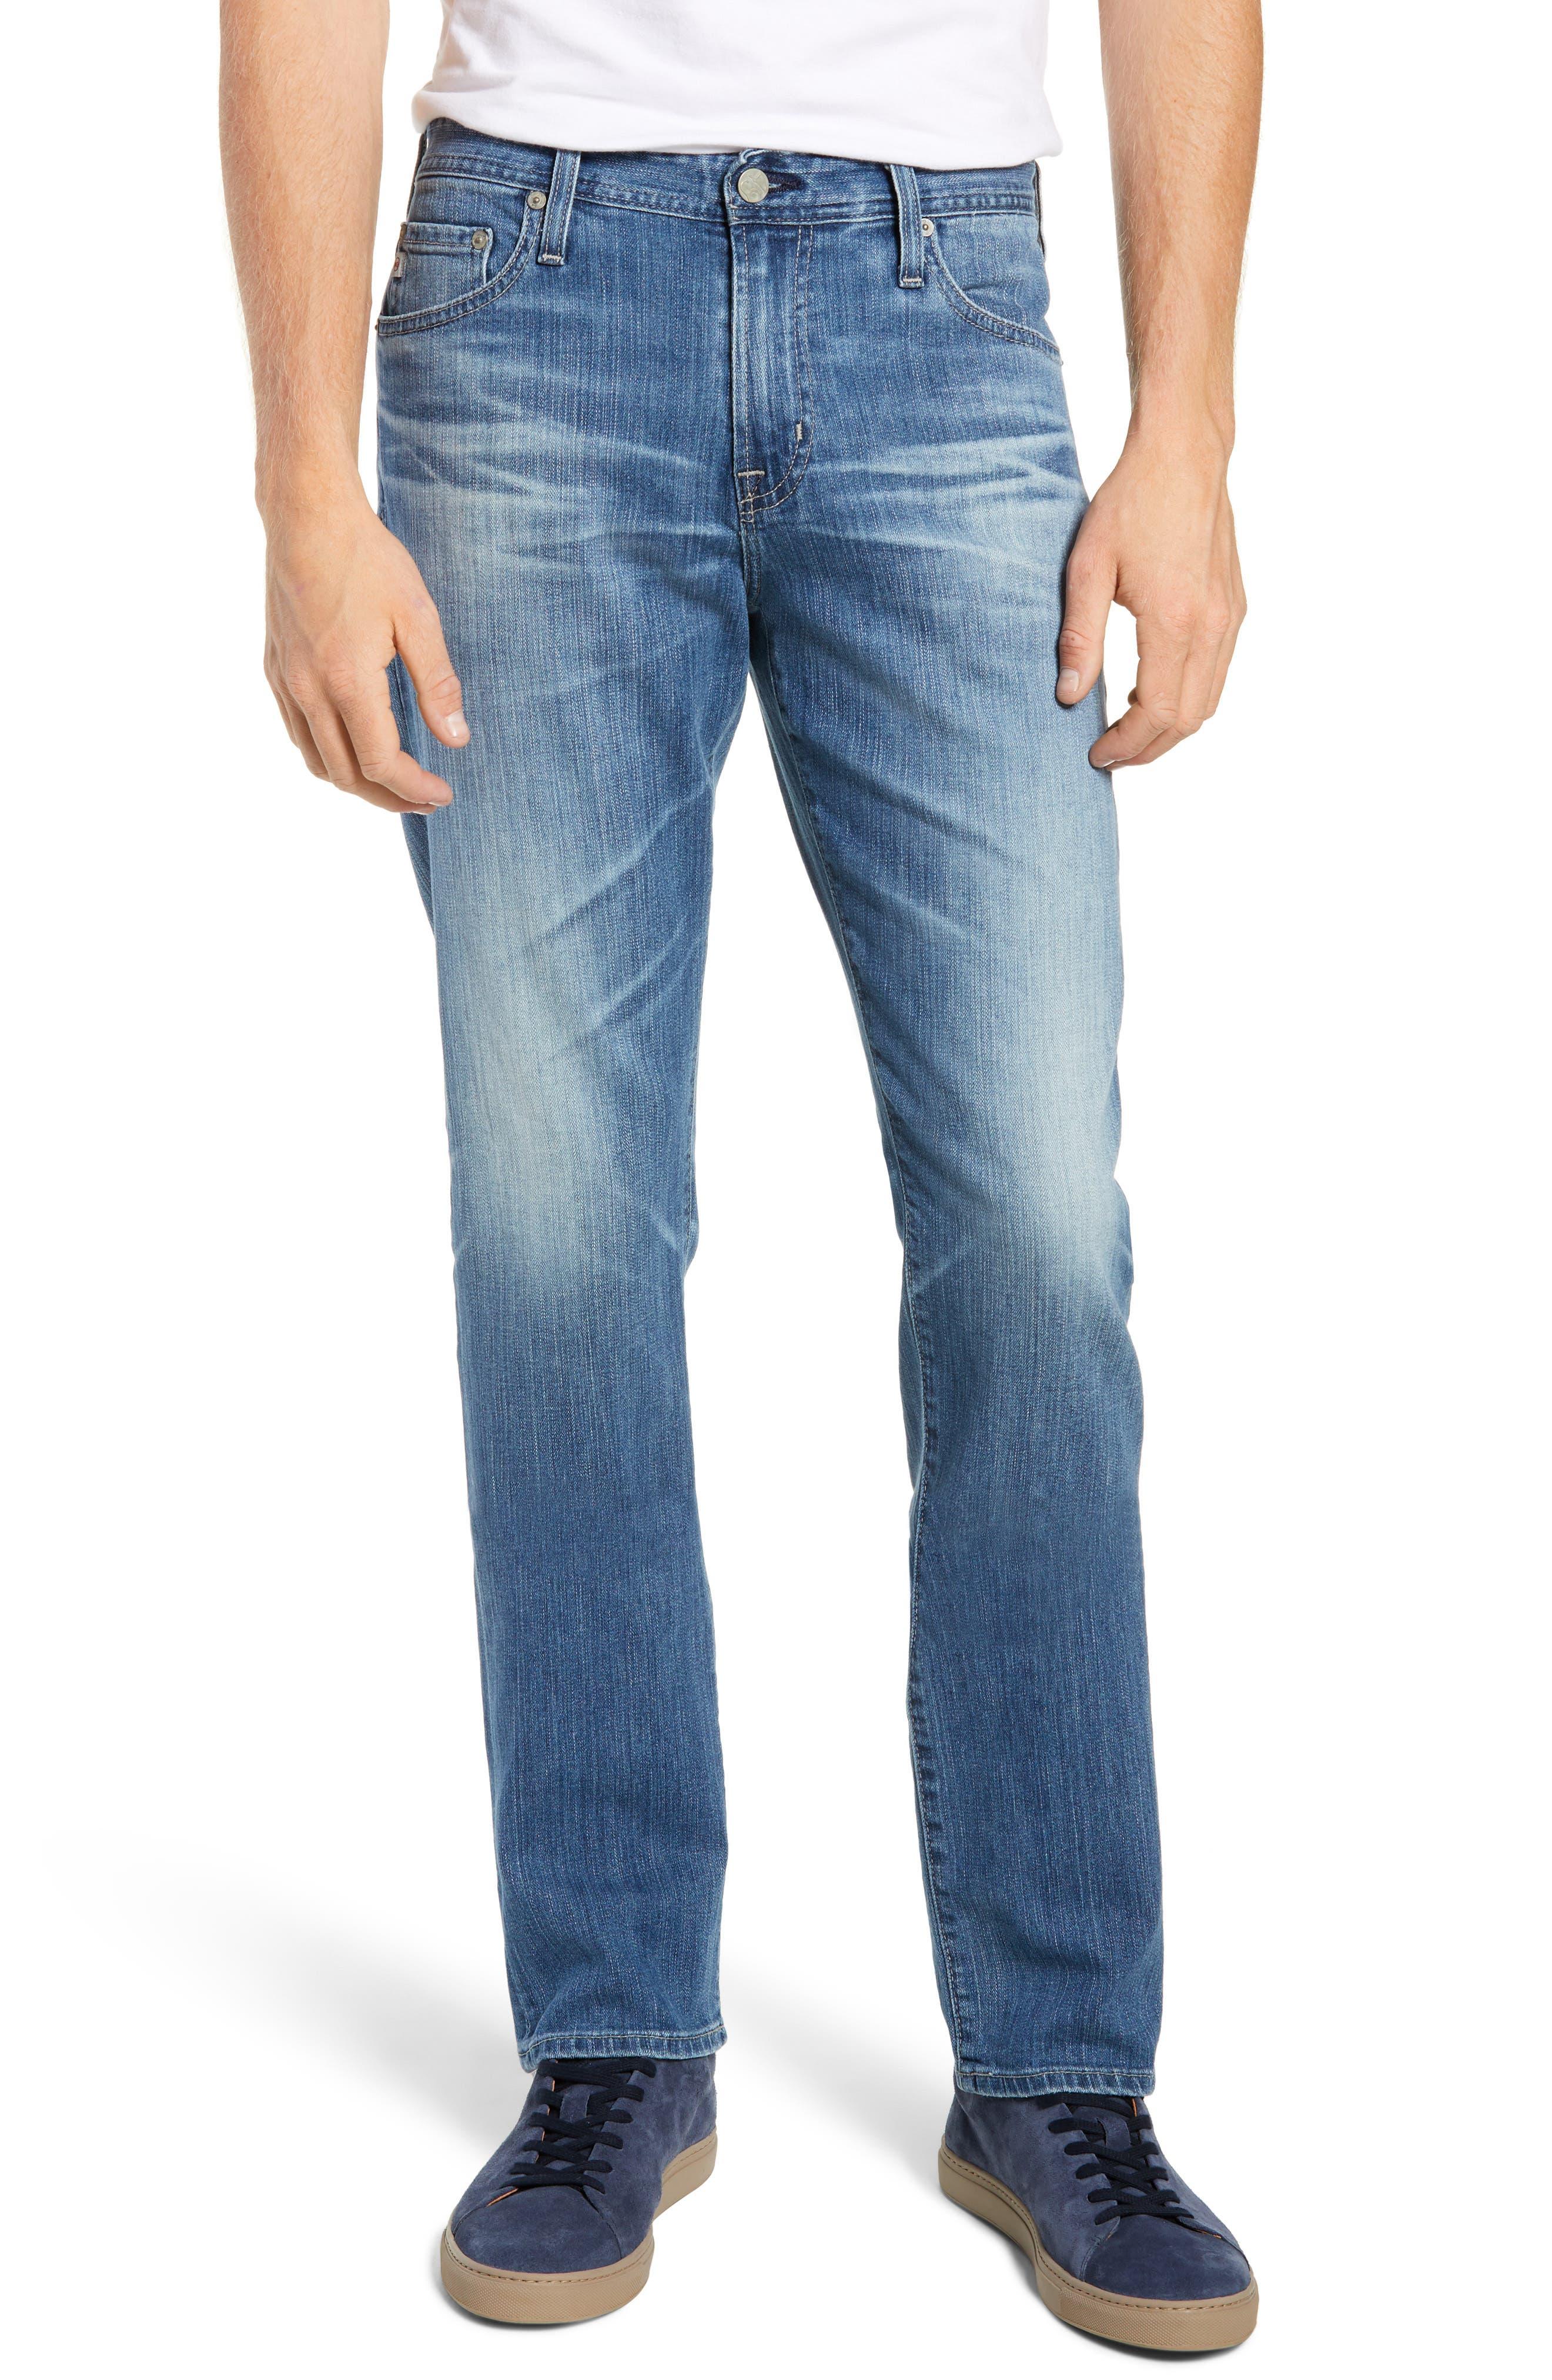 Everett Slim Straight Leg Jeans,                             Main thumbnail 1, color,                             14 YEARS ENGAGEMENT